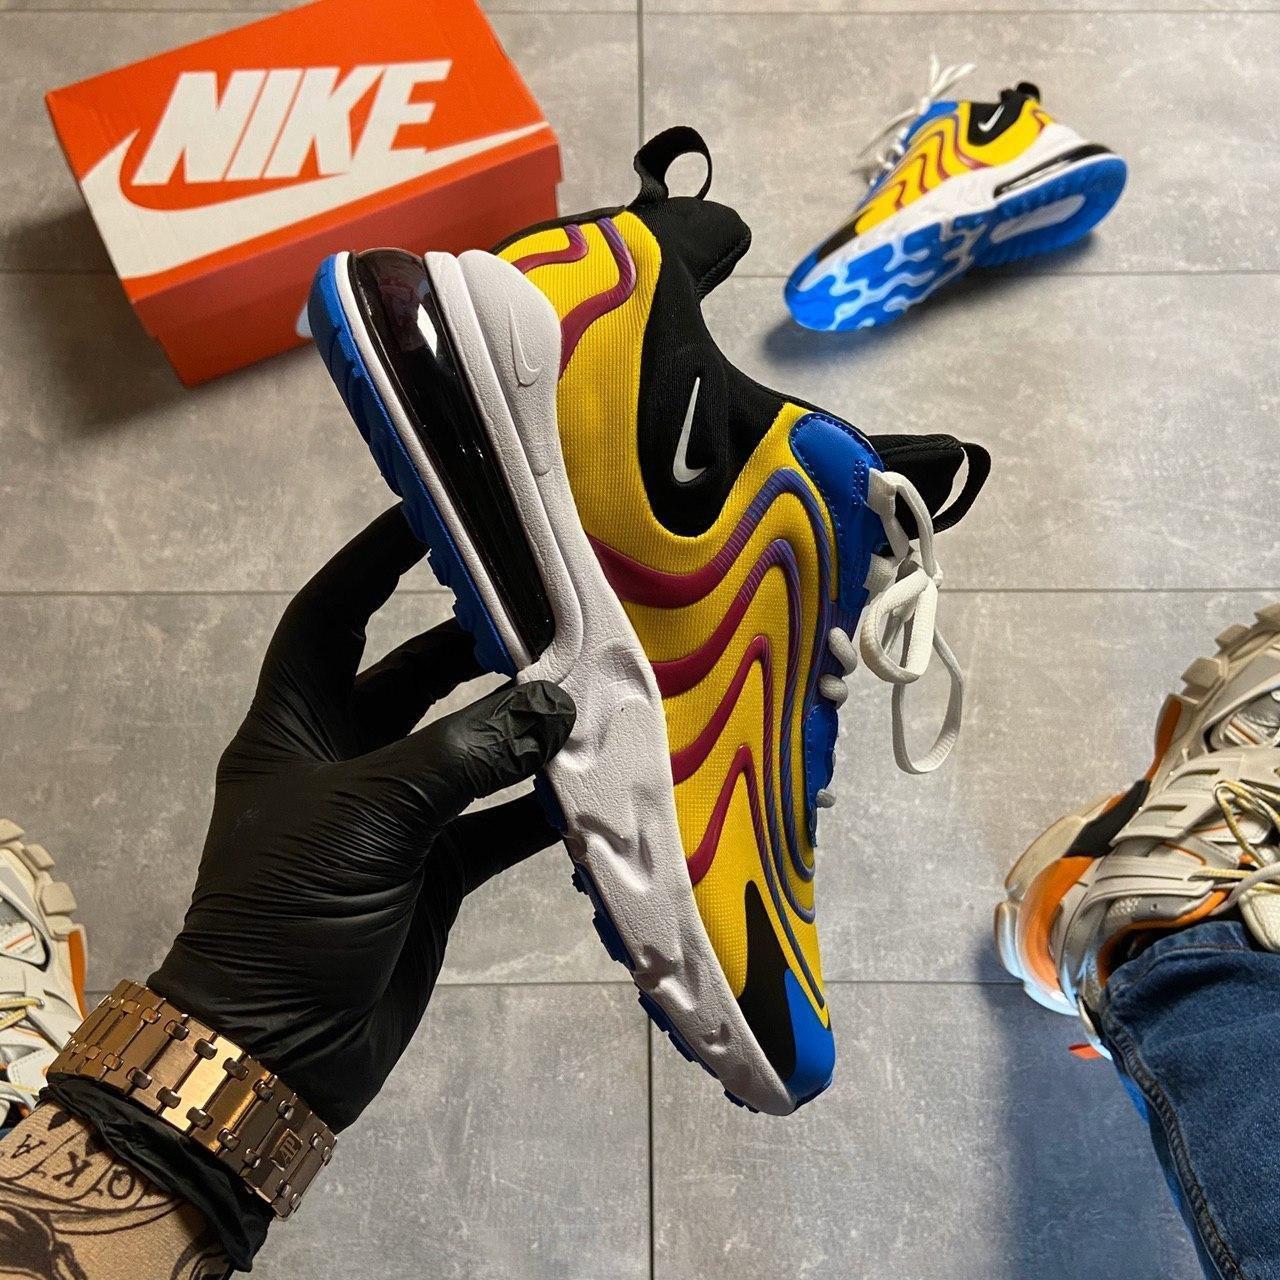 🔥 Nike Air Max 270 React Eng Yellow Blue Найк Аир Макс 270 🔥 Найк мужские кроссовки 🔥